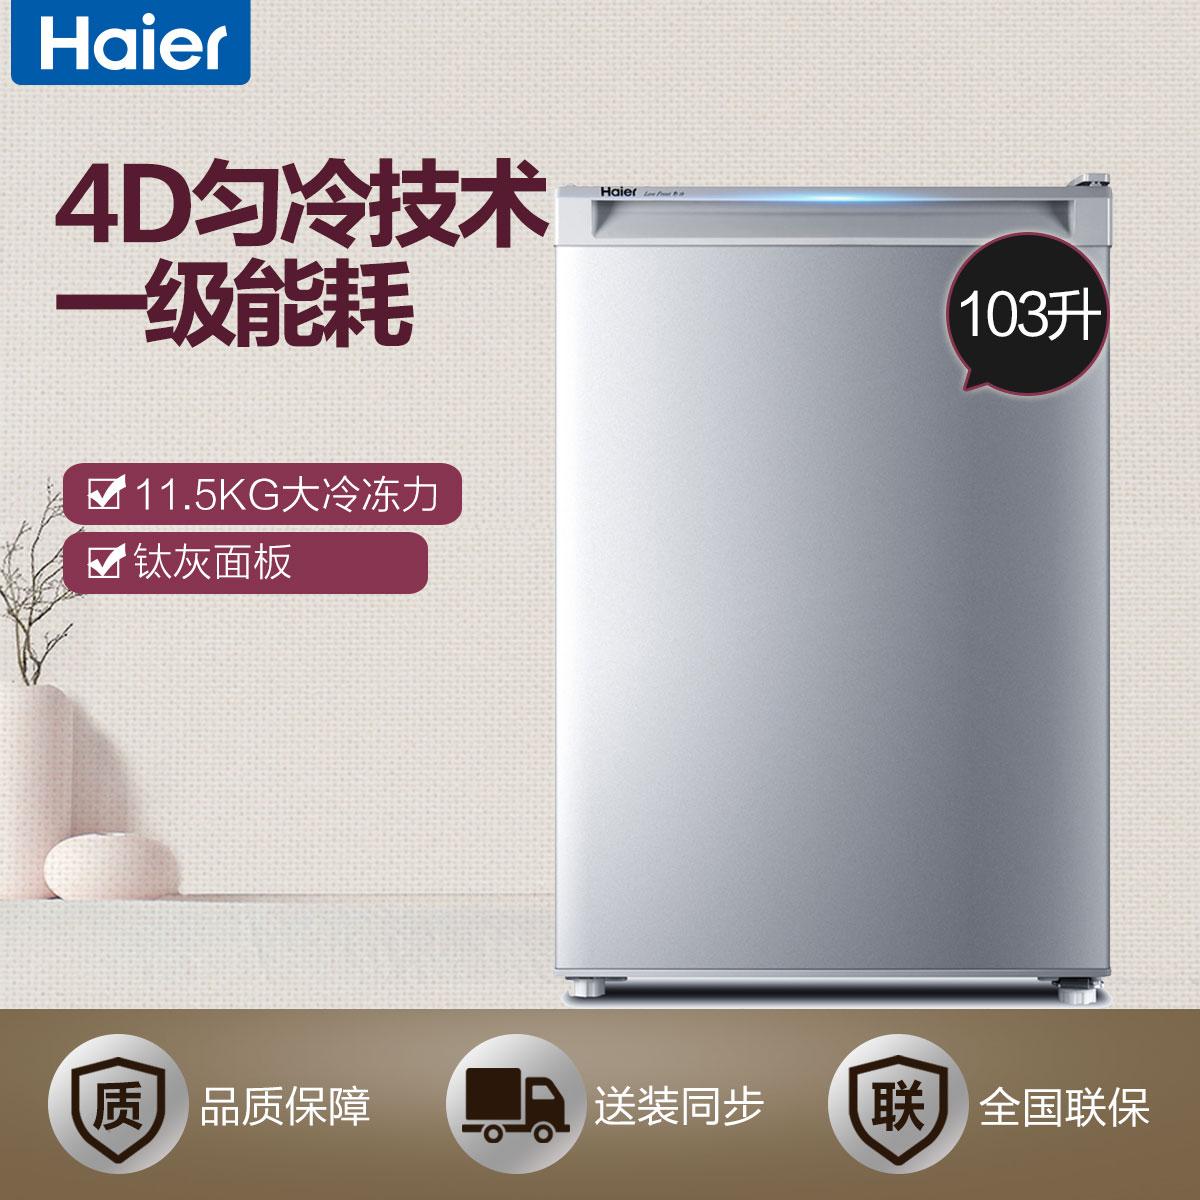 Haier/海尔 冷柜 BD-103DL